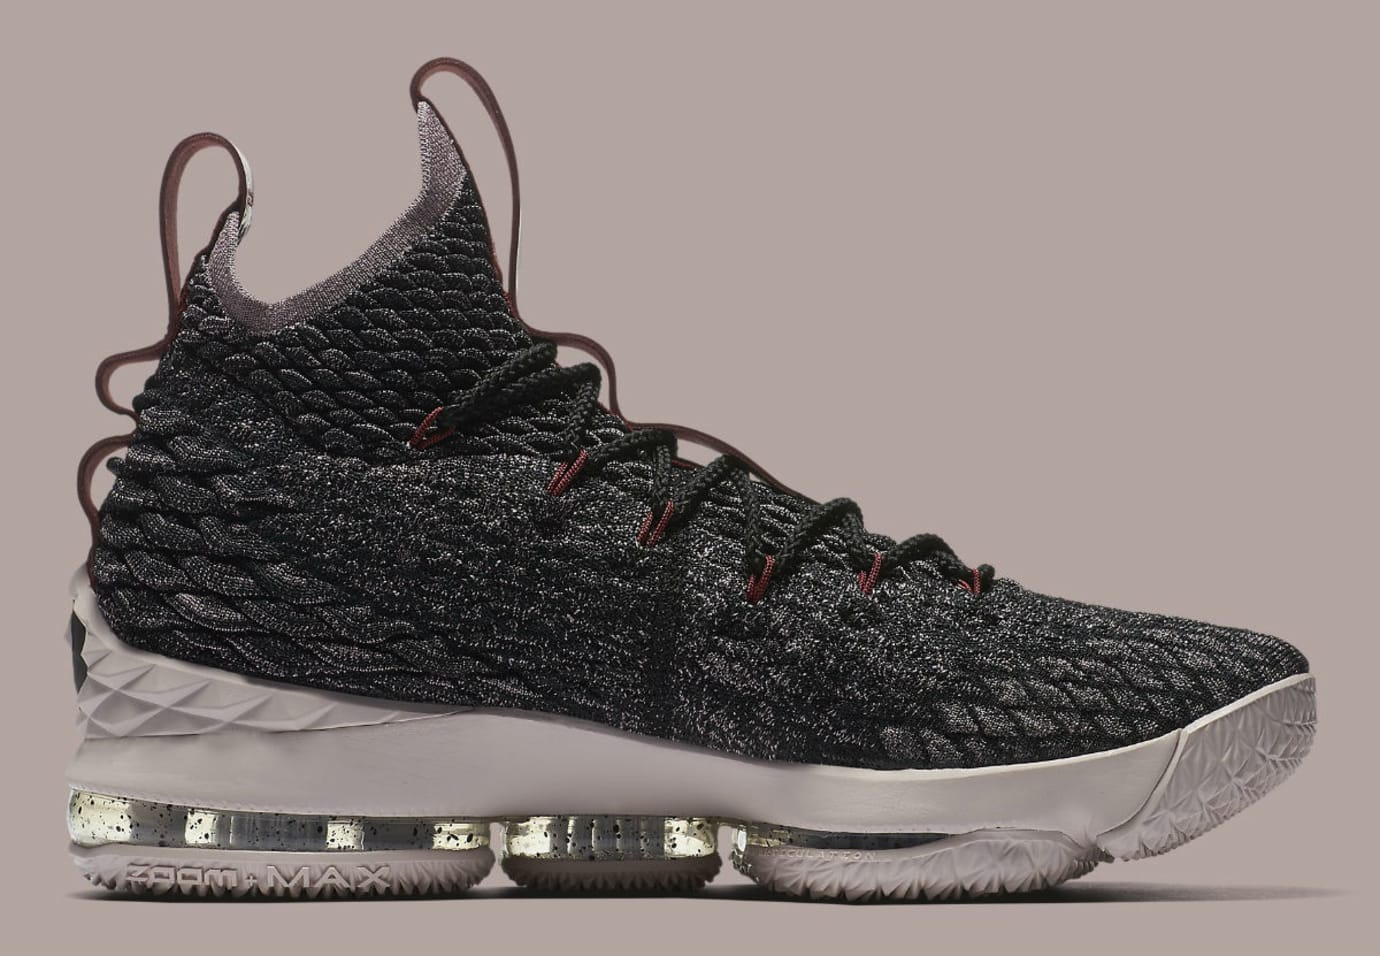 Nike LeBron 15 Pride of Ohio Release date 897648-003 Medial